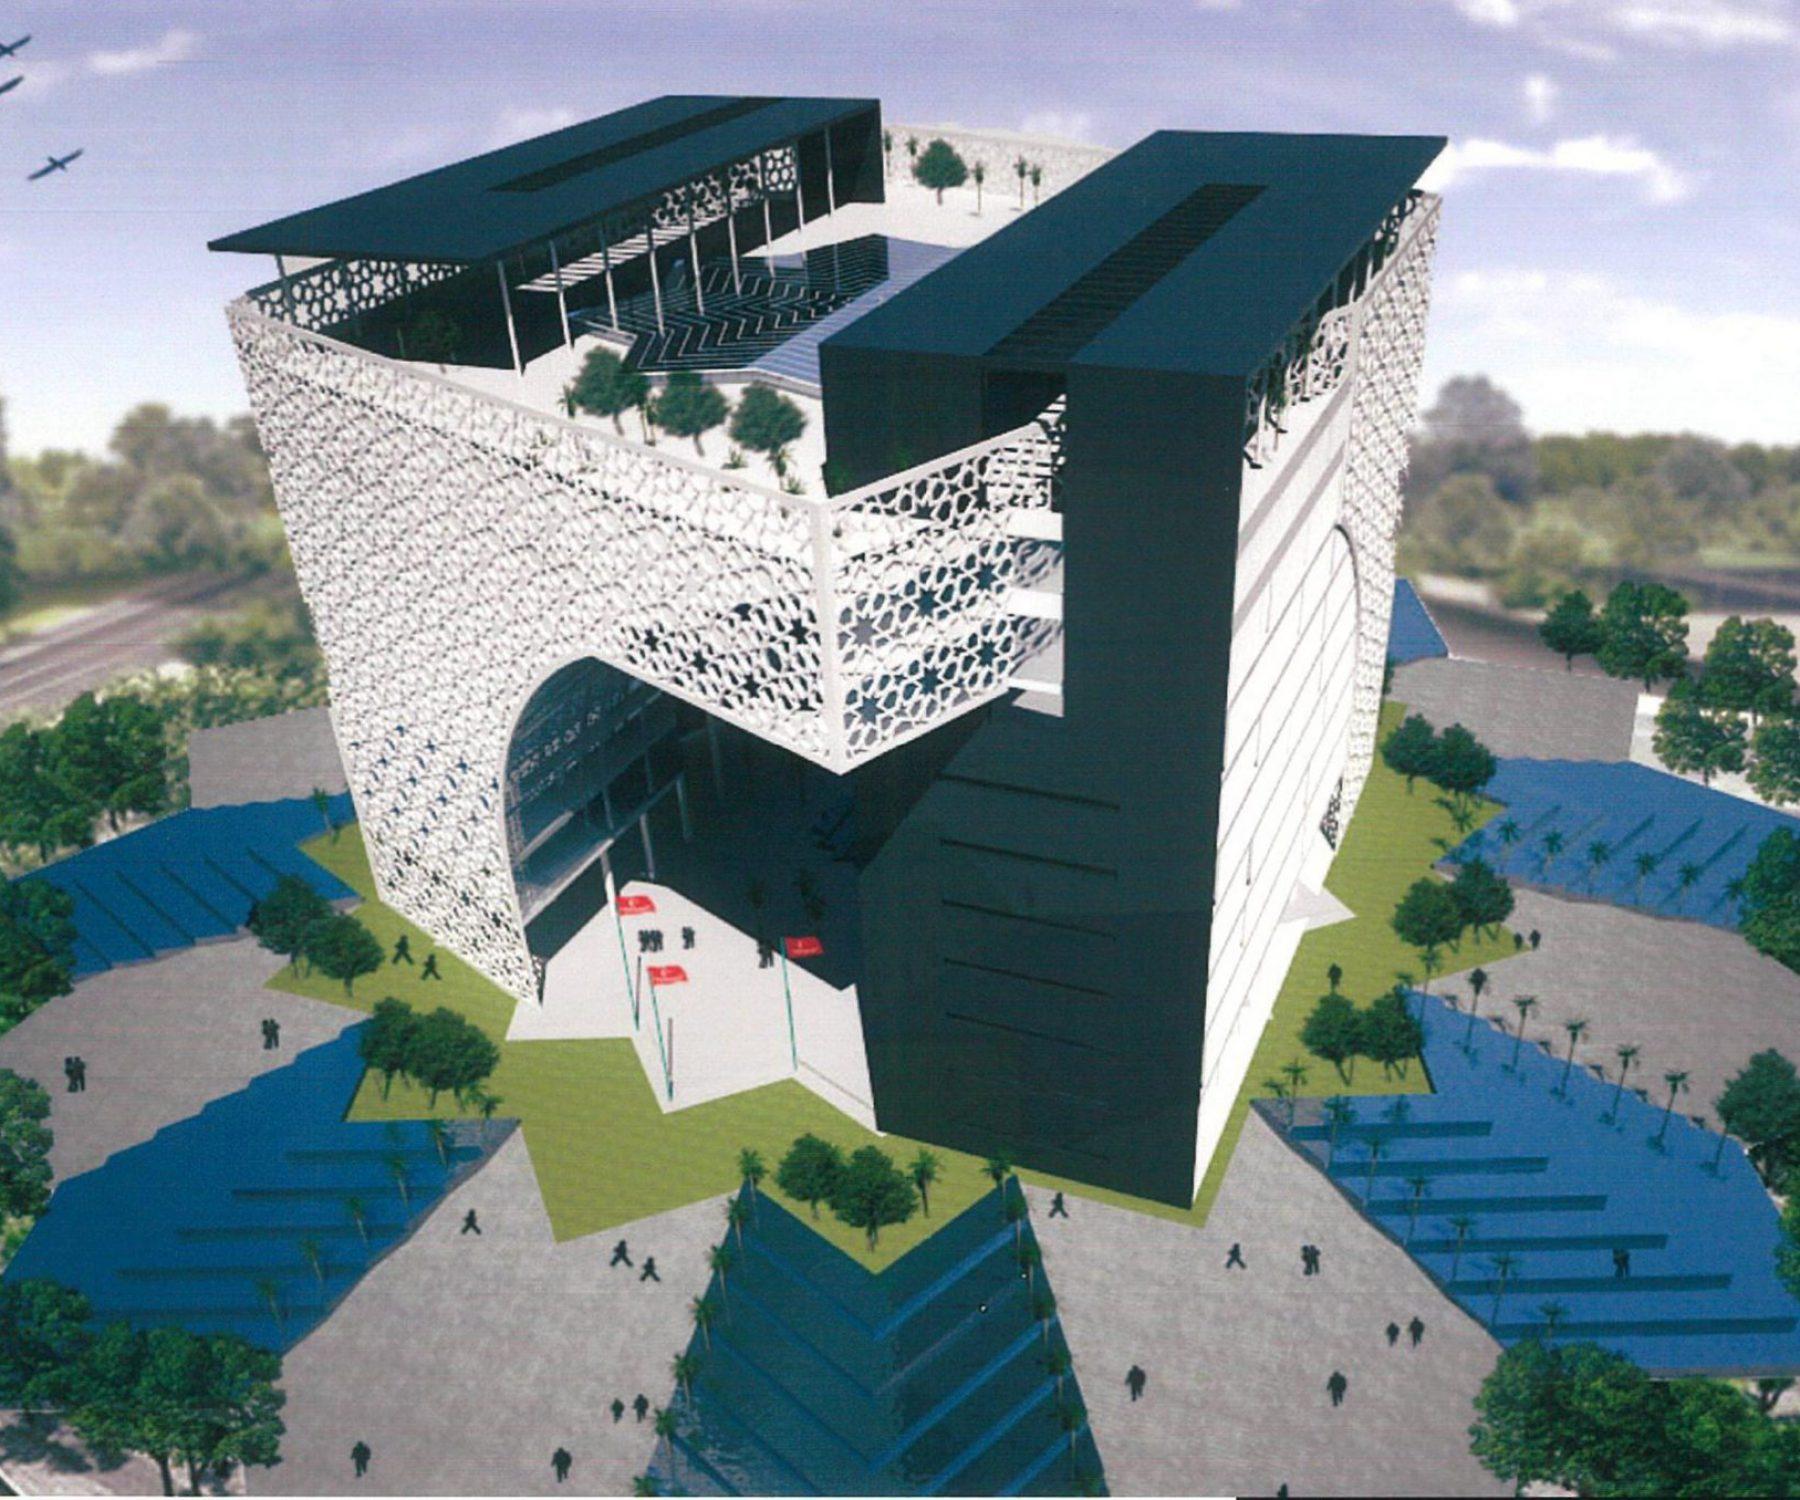 GOVERNOR'S OFFICE - KOTA INDRAPURI